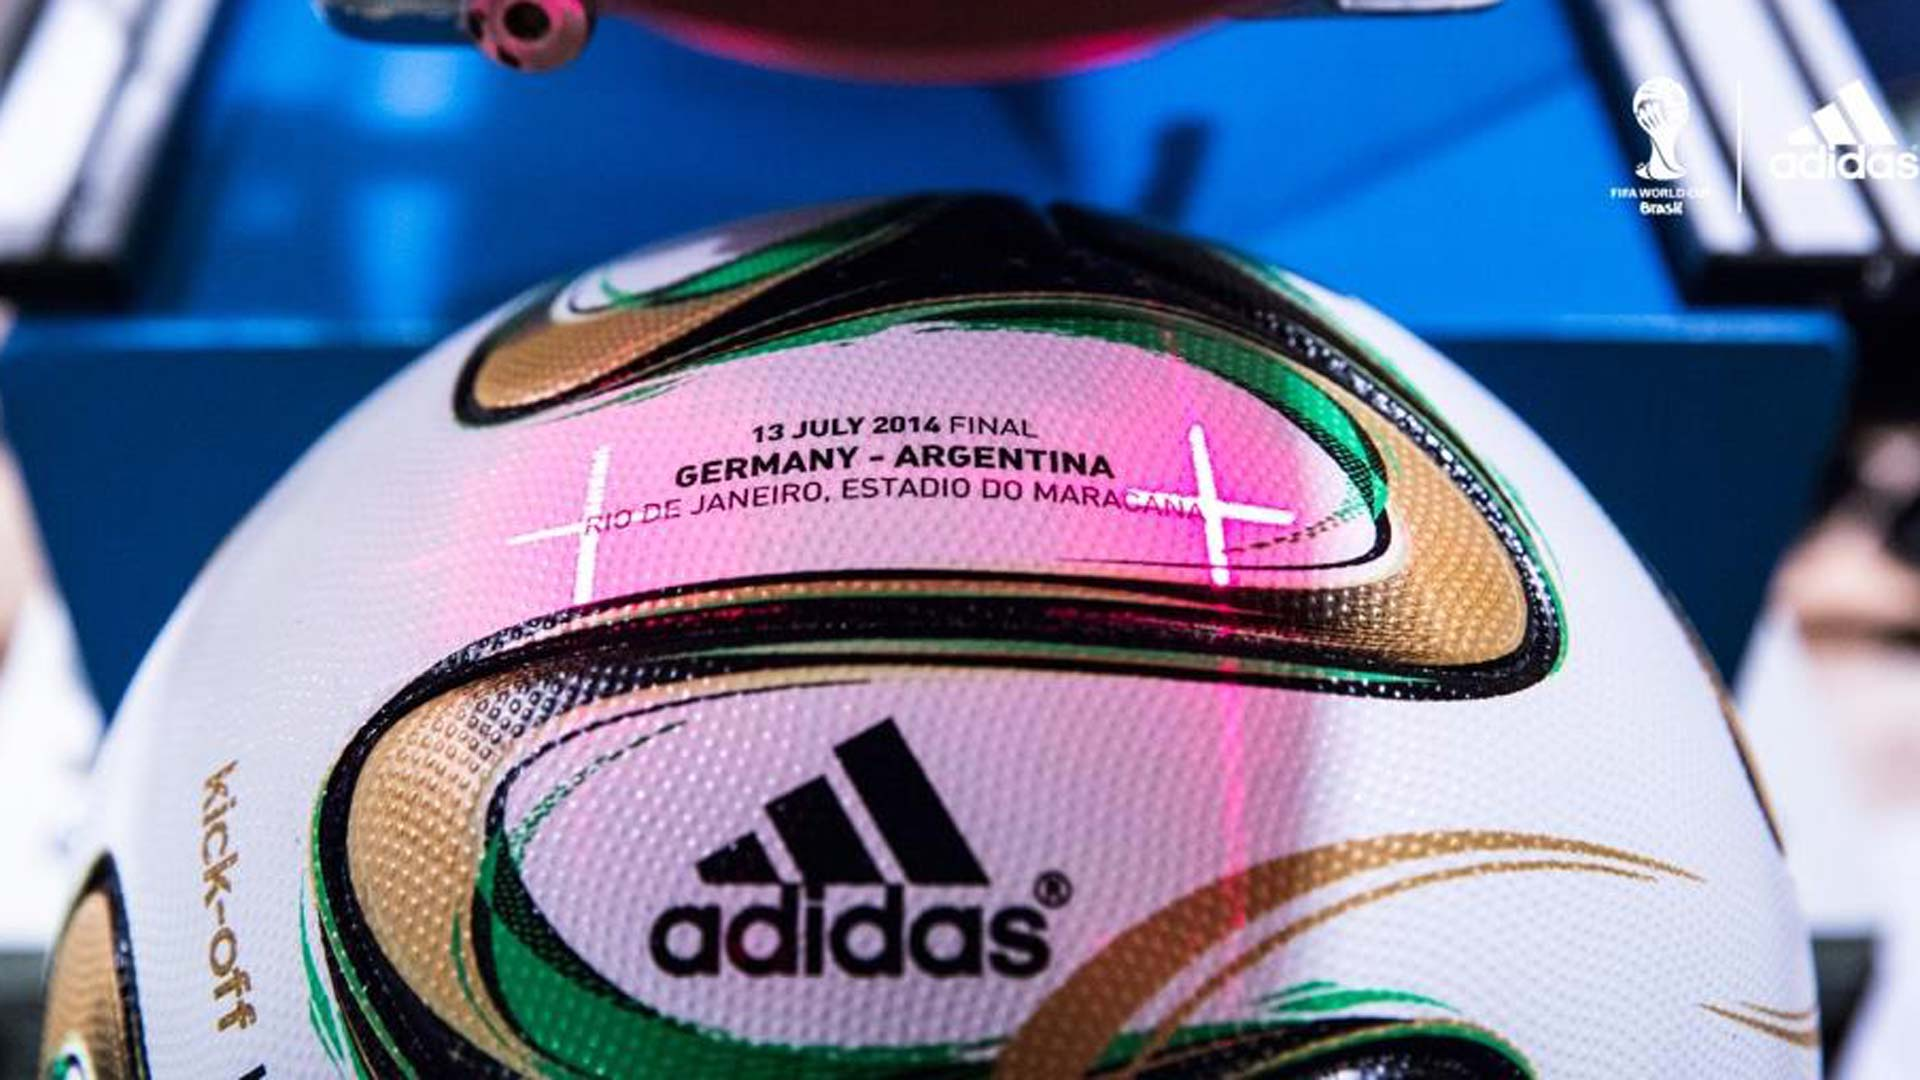 brazuca-final-071014-FTR-adidas.jpg